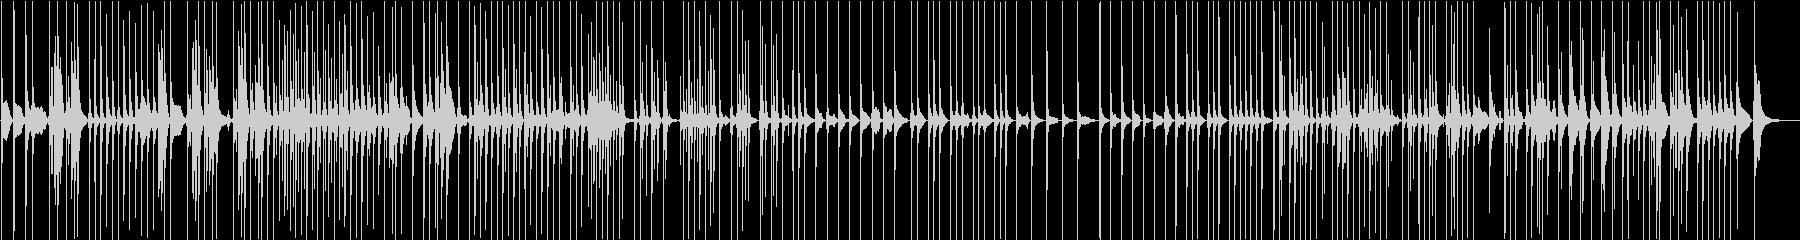 三味線165花見踊5合方元禄酒飲み会宴会の未再生の波形